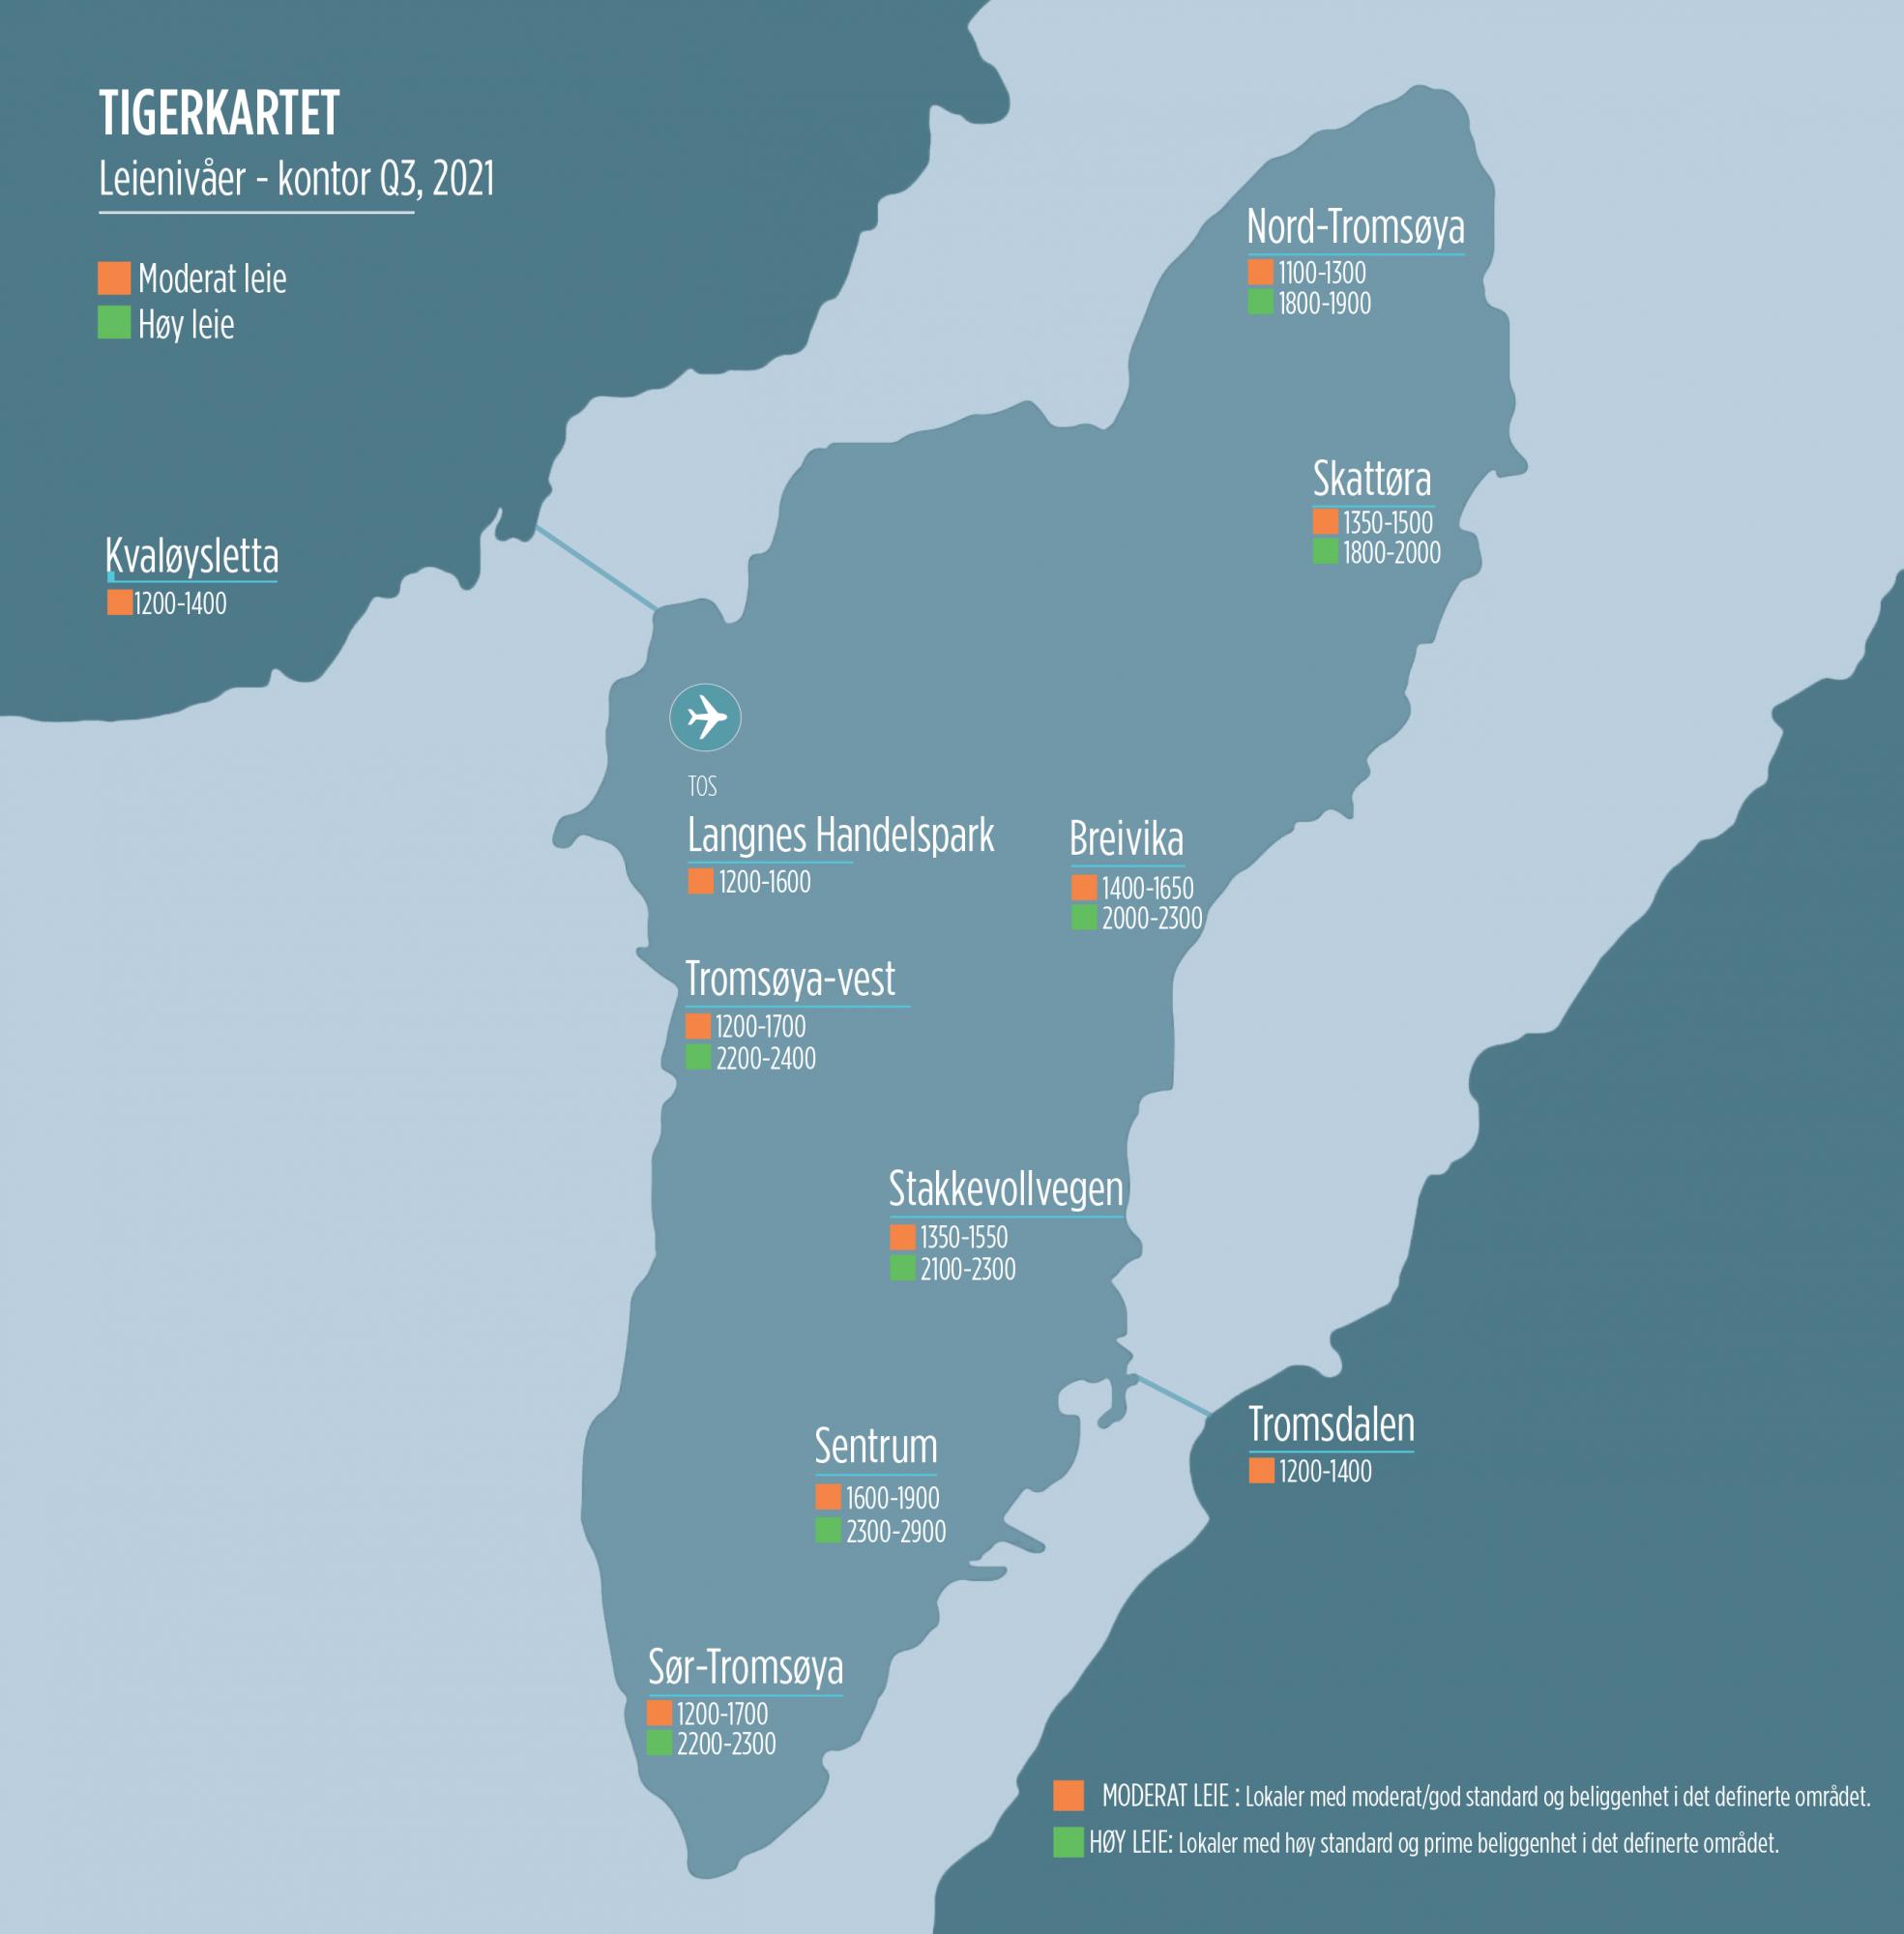 Tigerkartet Tromsø 2021